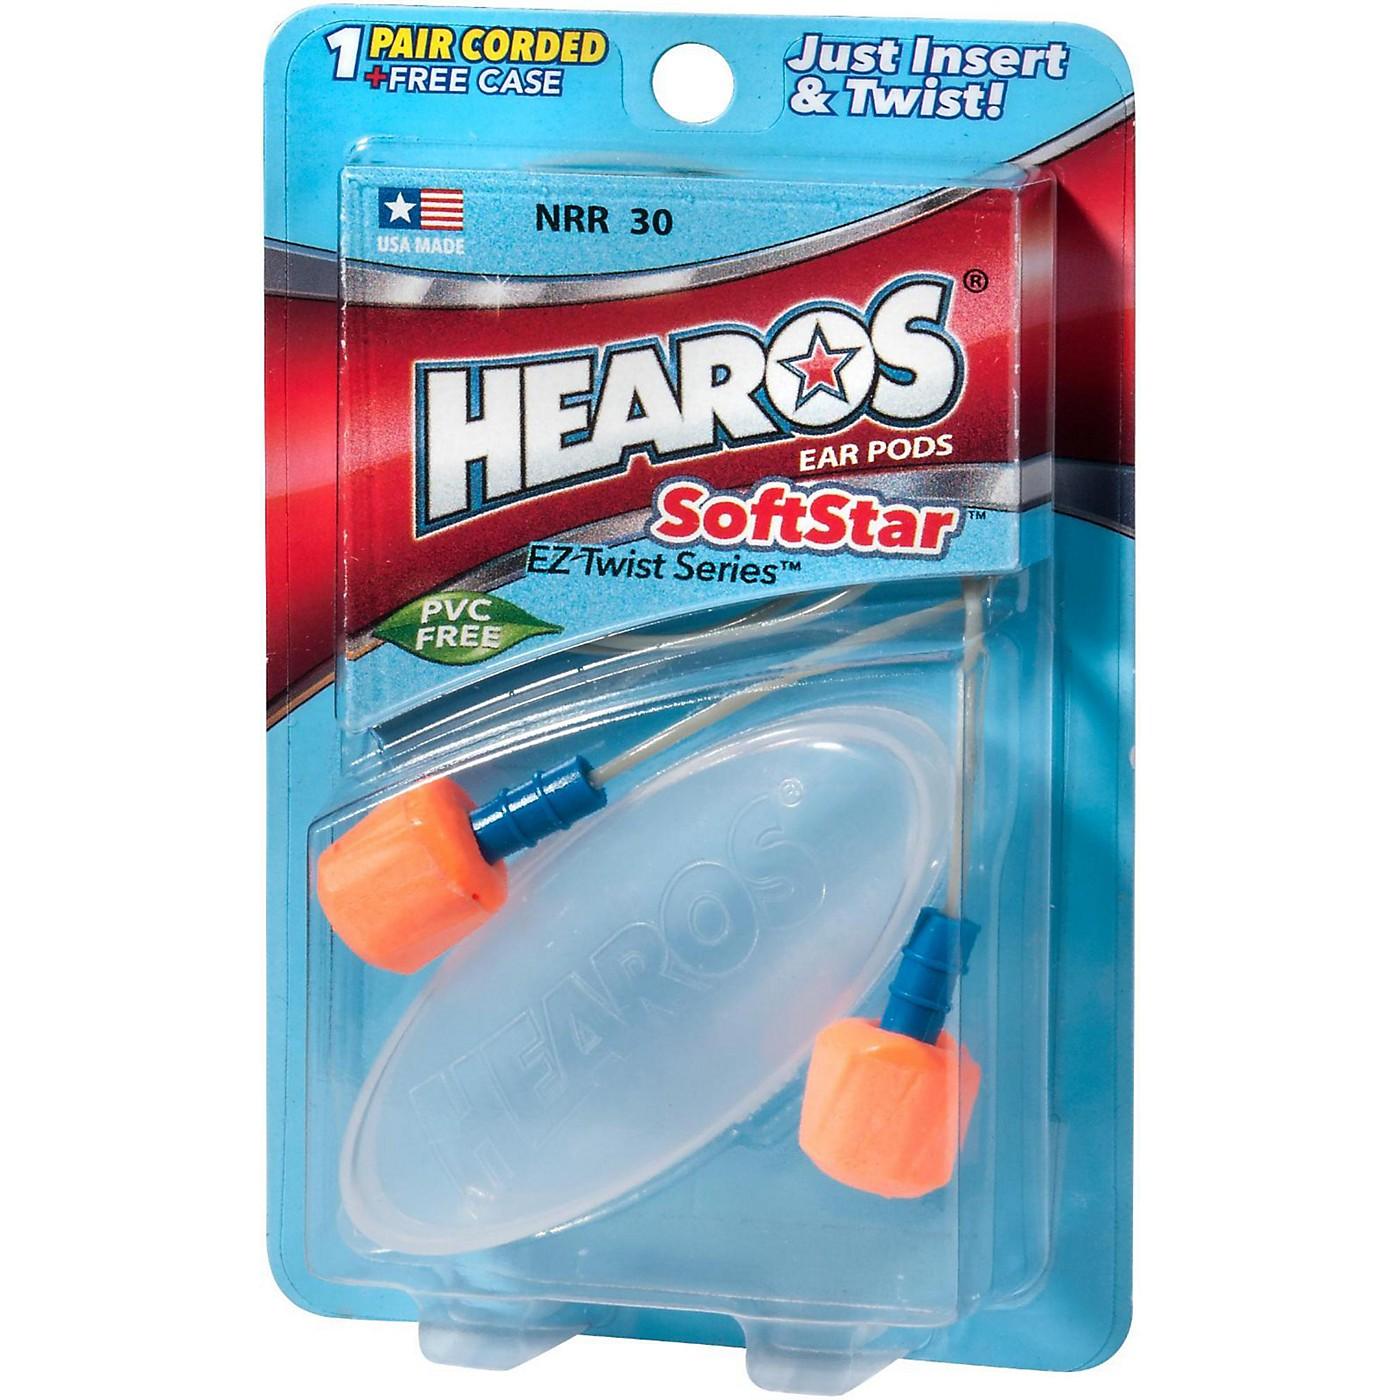 Hearos SoftStar EZ Twist - 1 Pair Corded With Case thumbnail